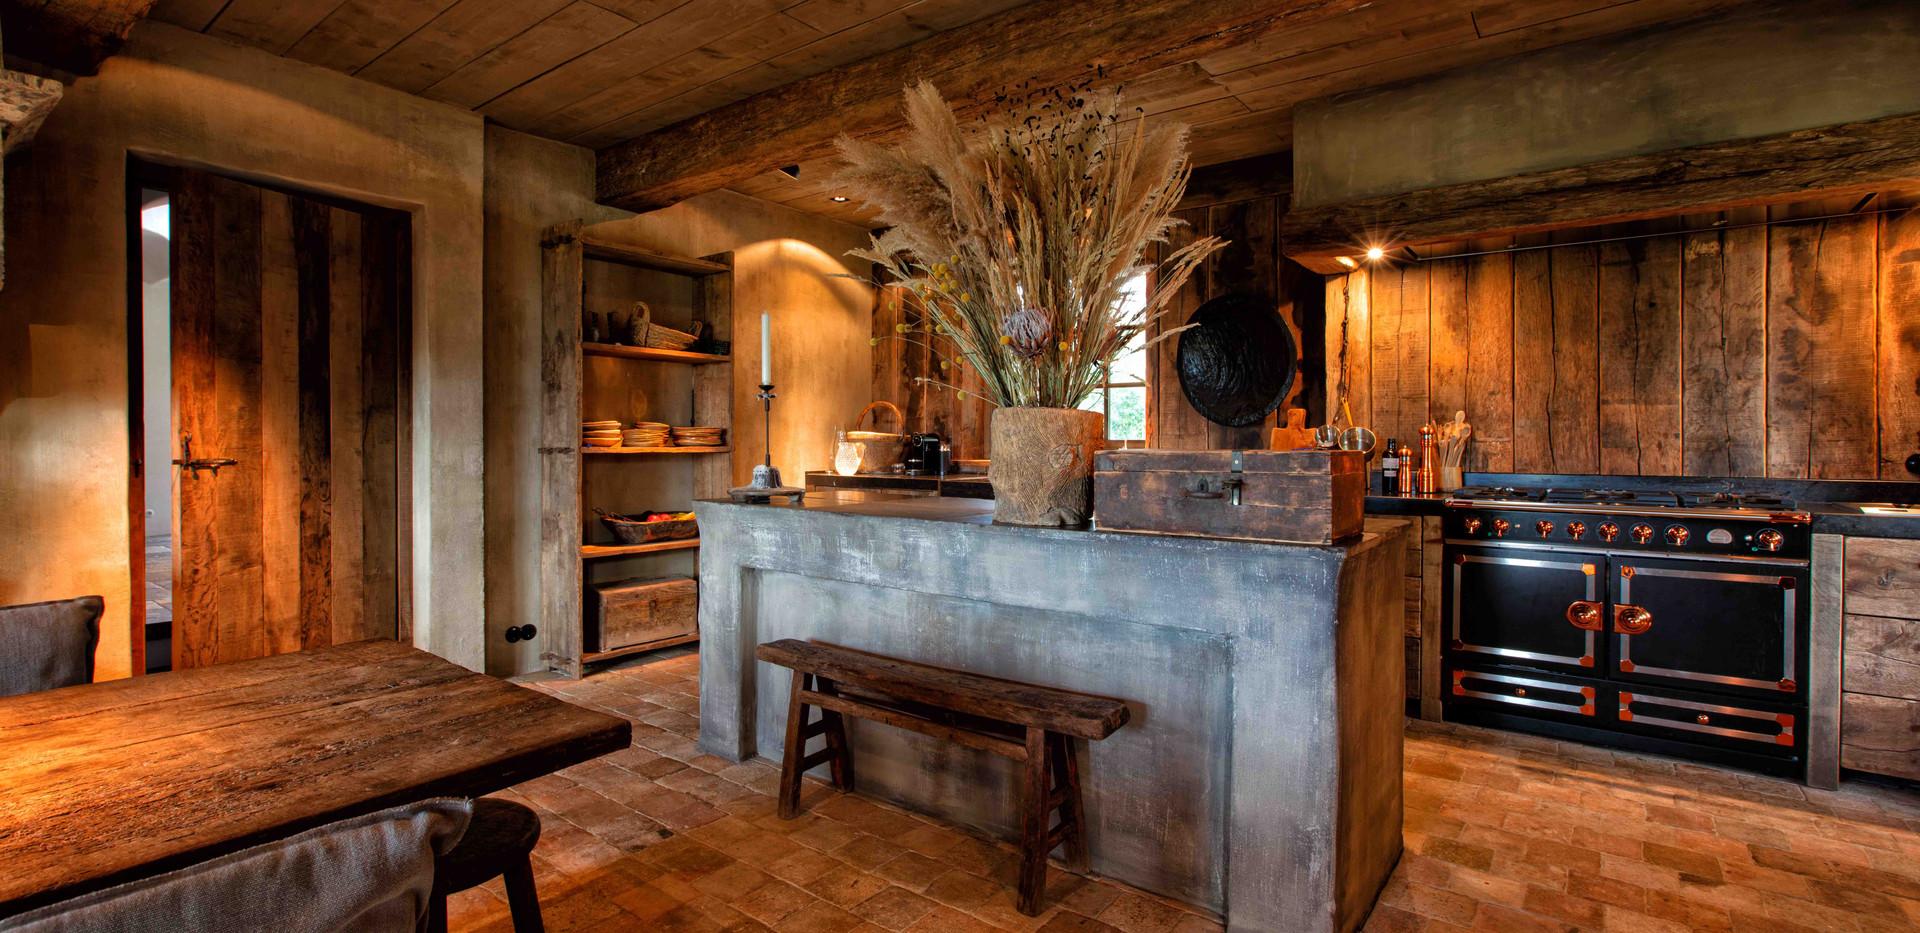 Middeleeuwse Keuken